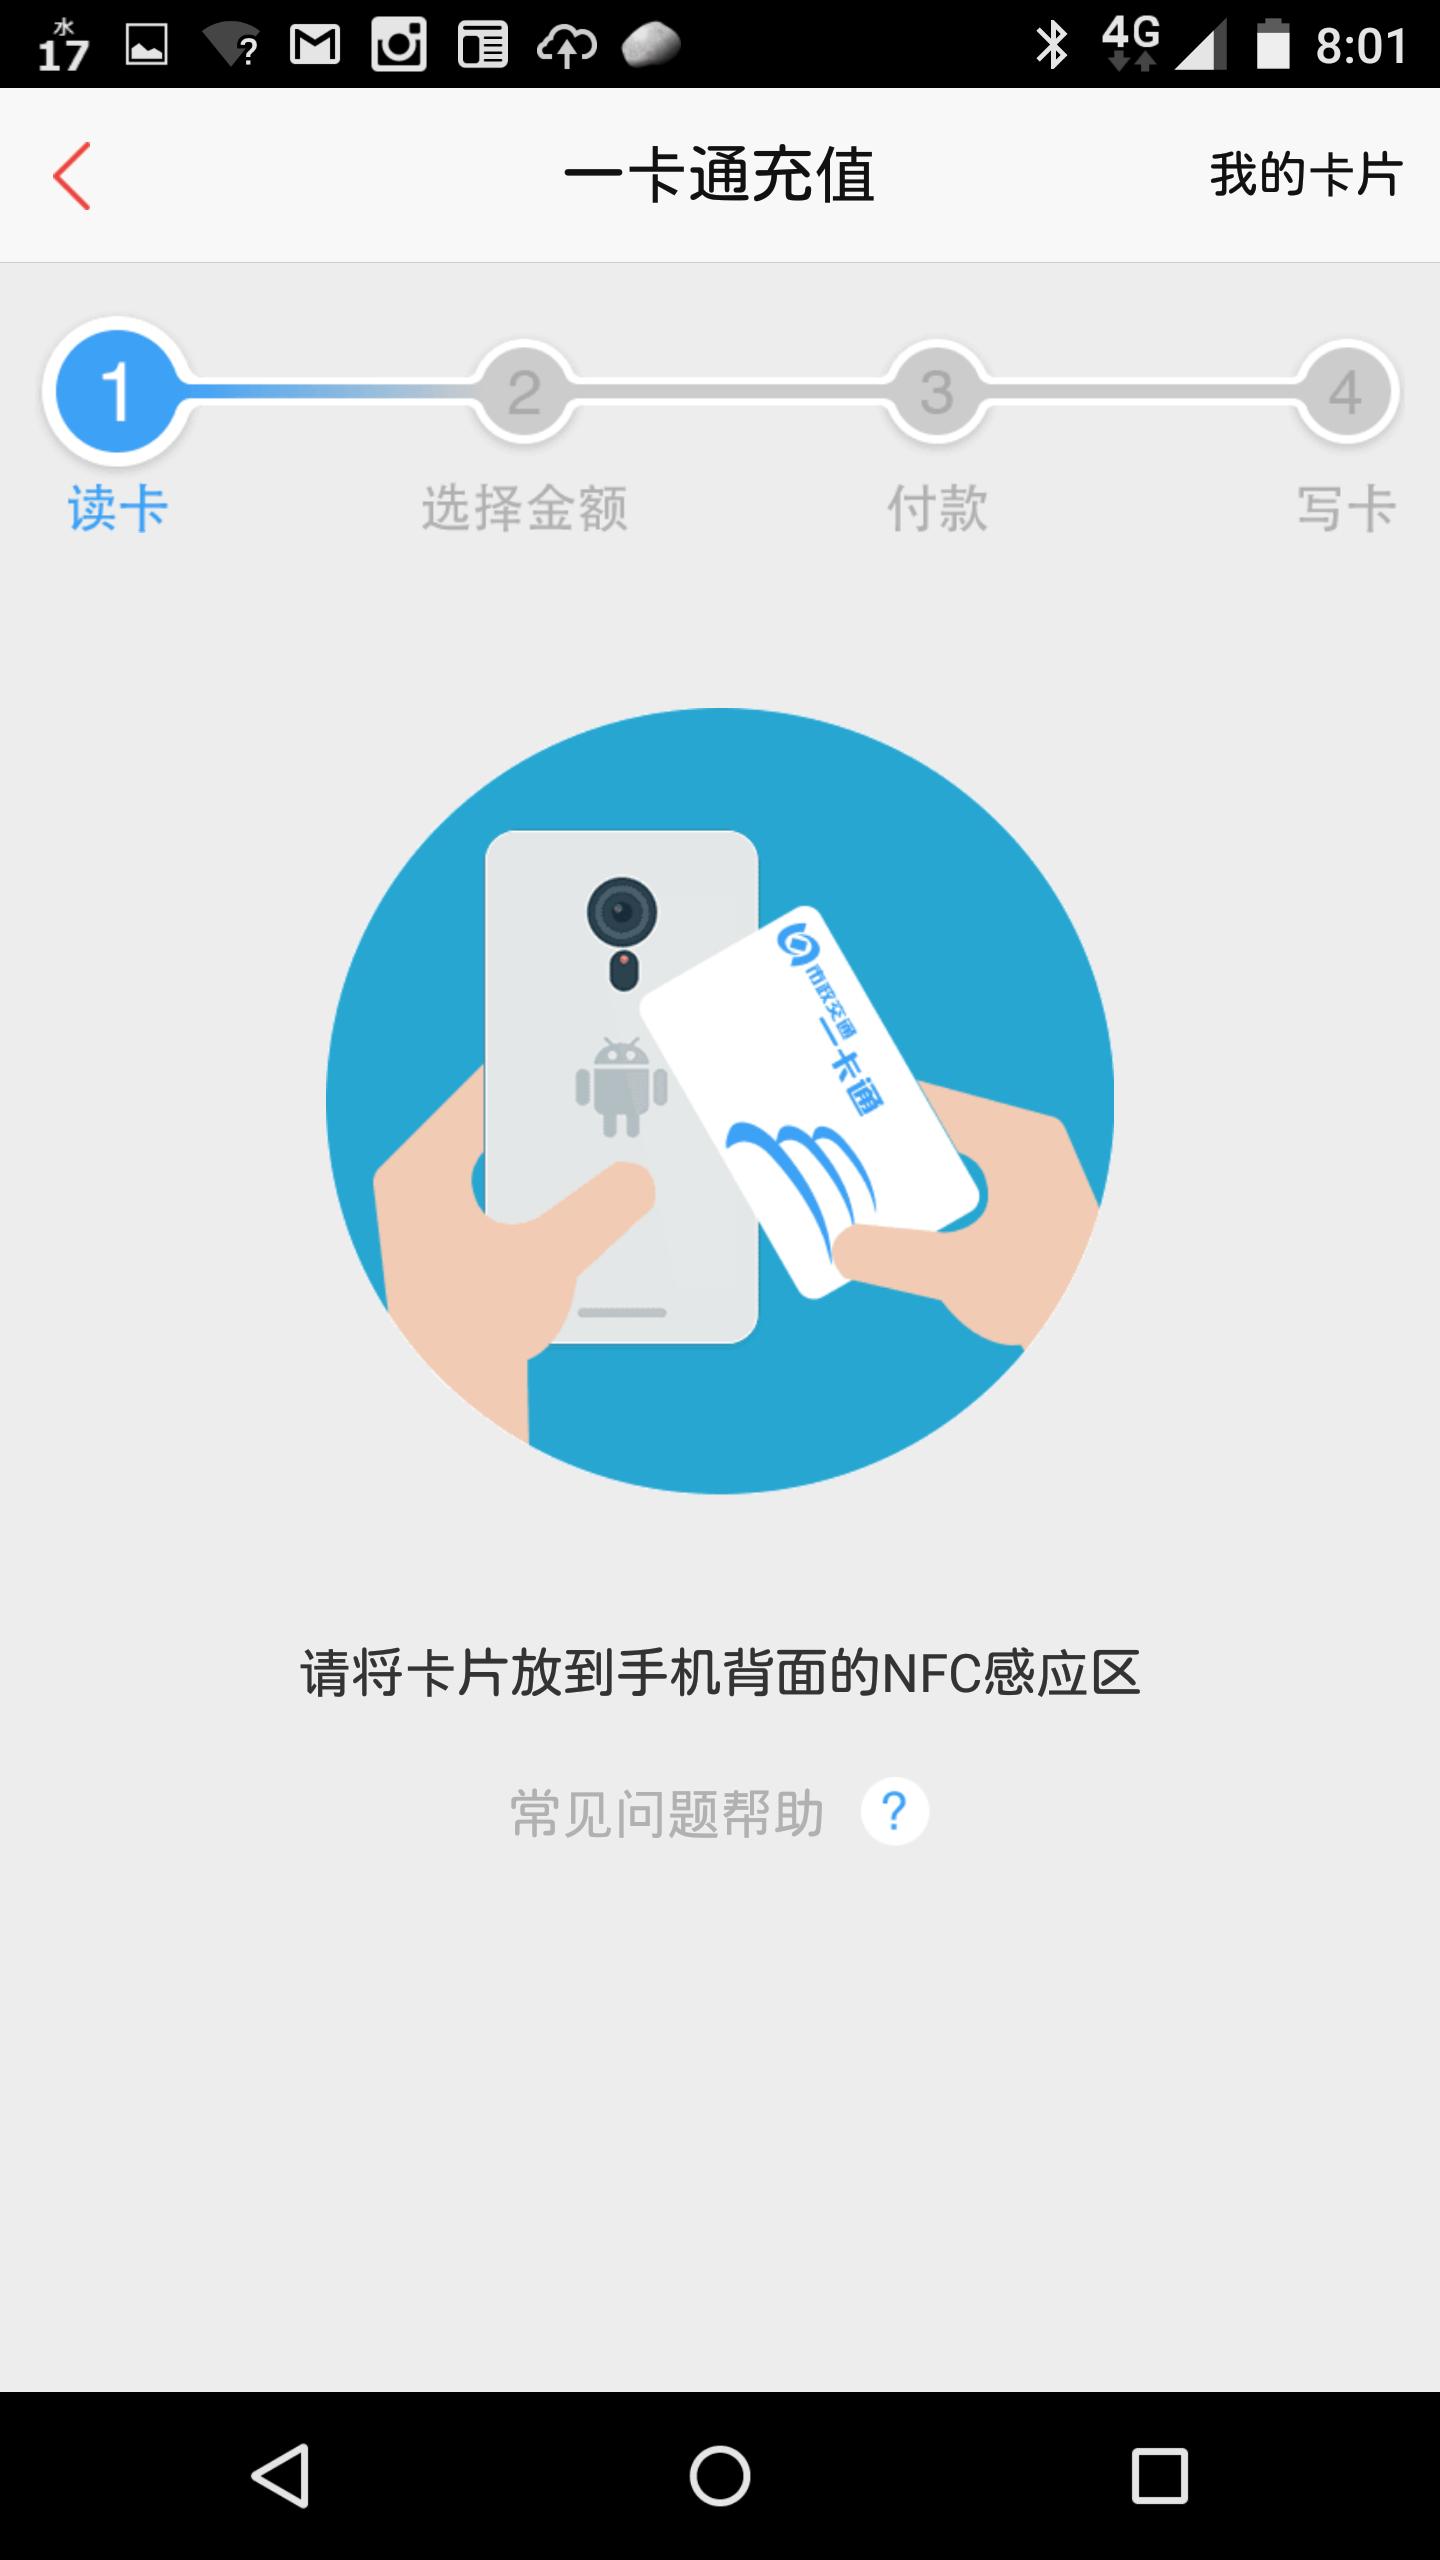 NFCCardBaiduMap